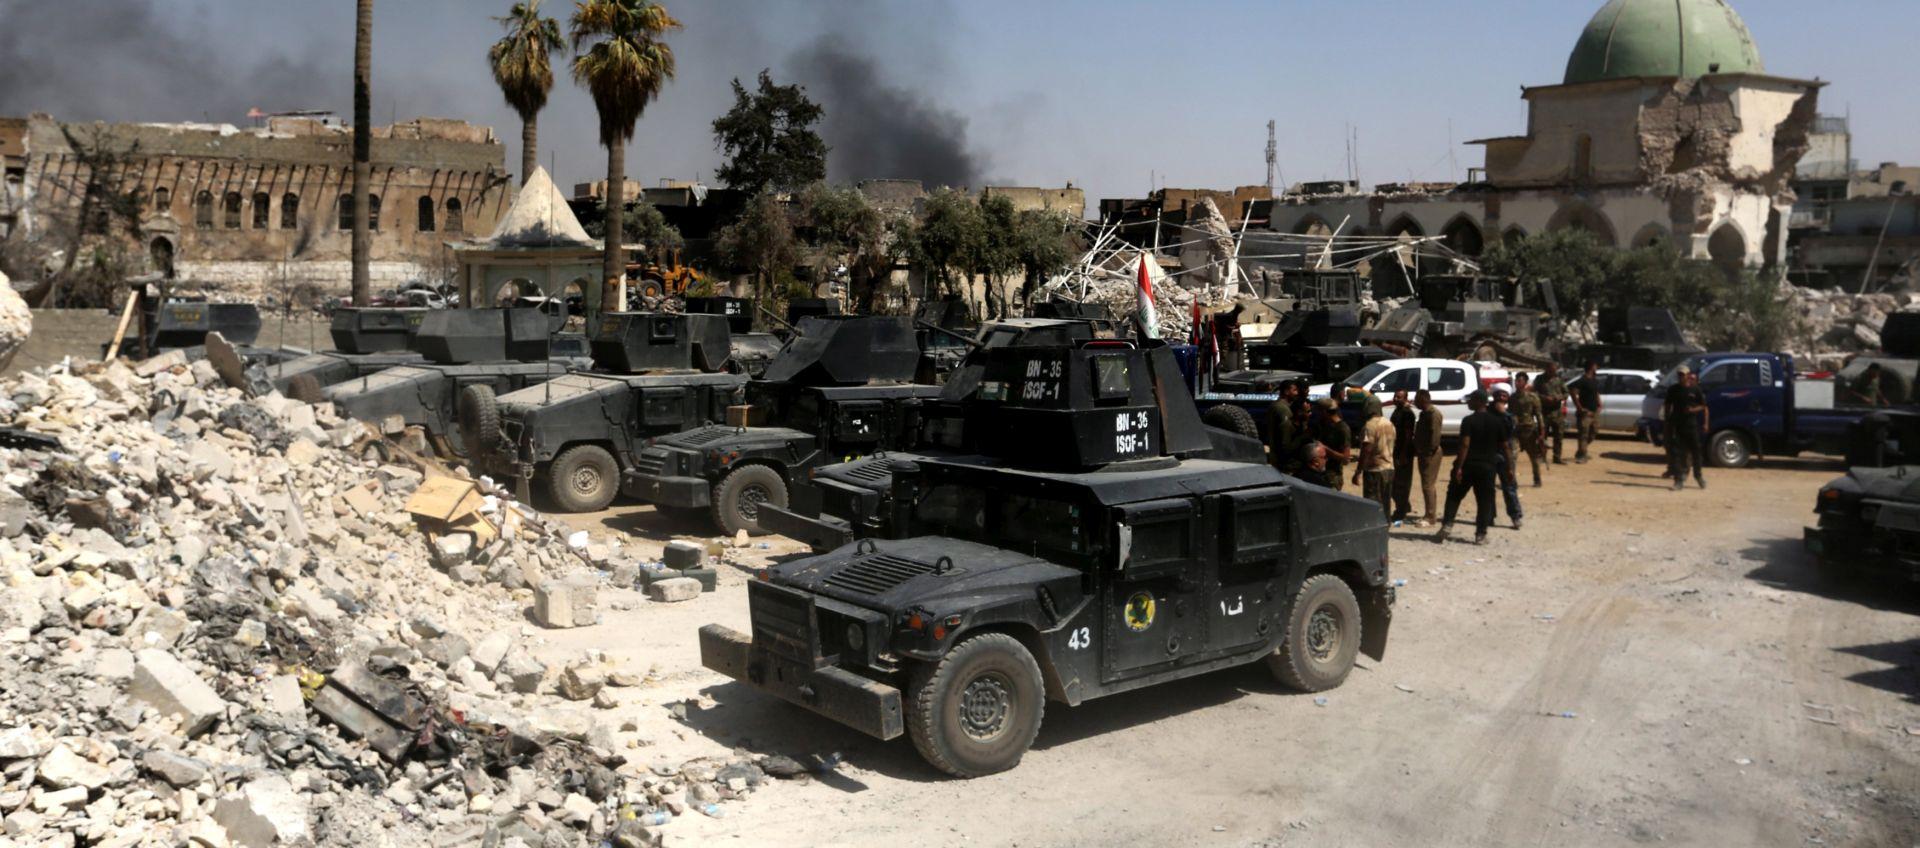 IRAČKA TV Pobjeda nad IS-om u Mosulu bit će objavljena idućih sati